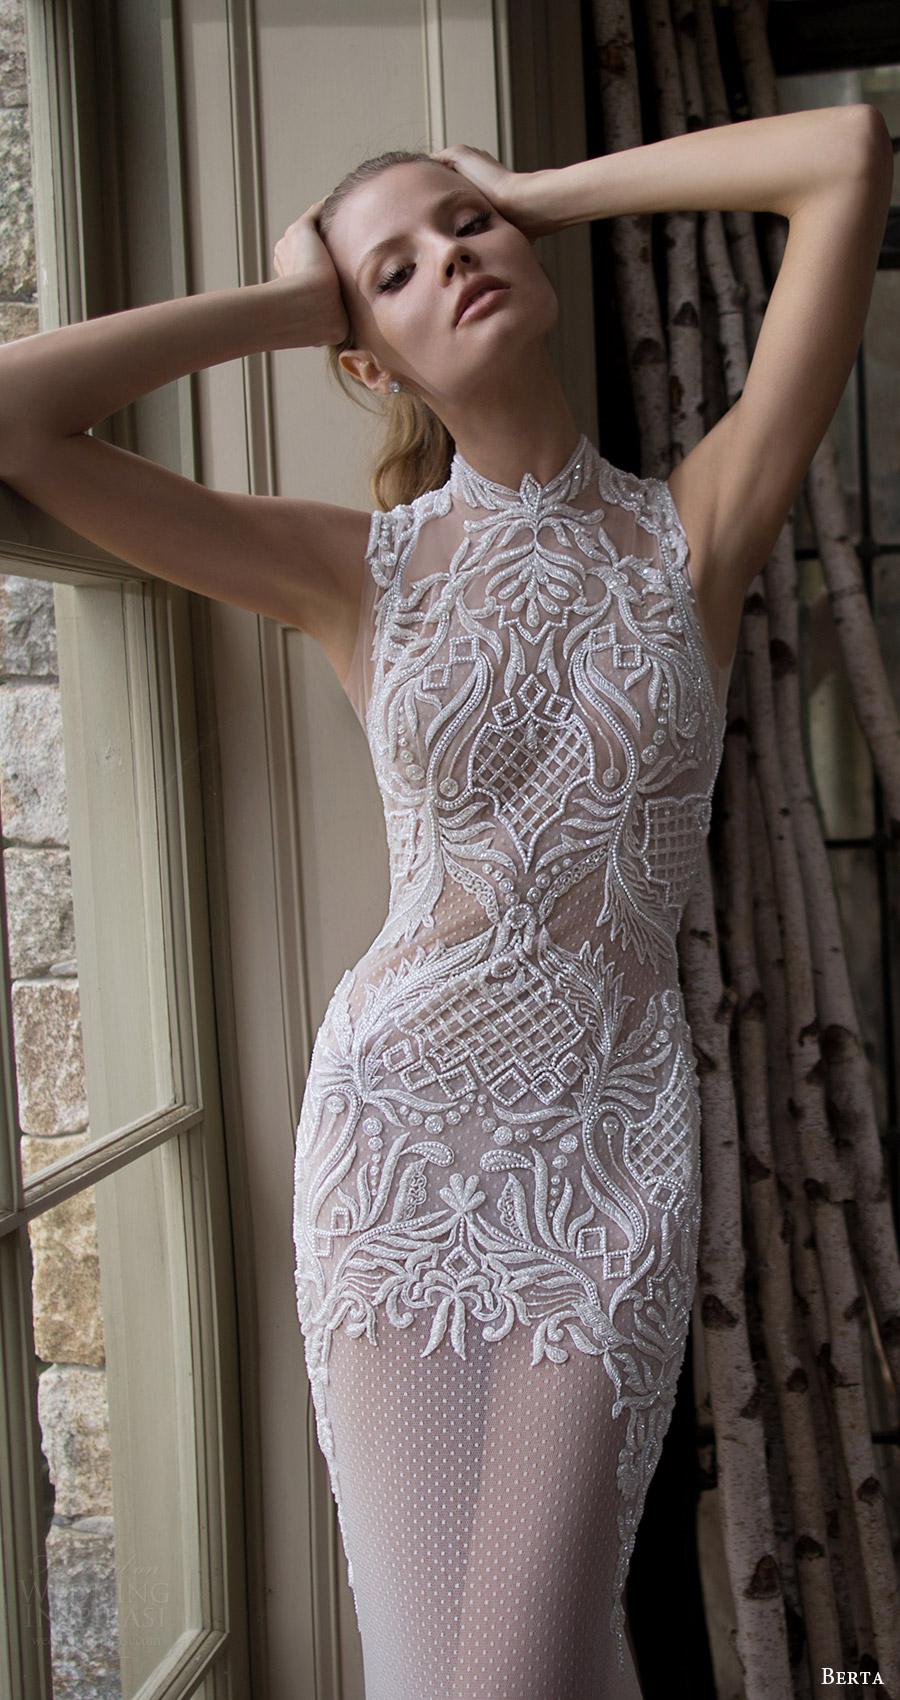 berta bridal fall 2016 sleeveless high neck trumpet wedding dress (16 116) zfv